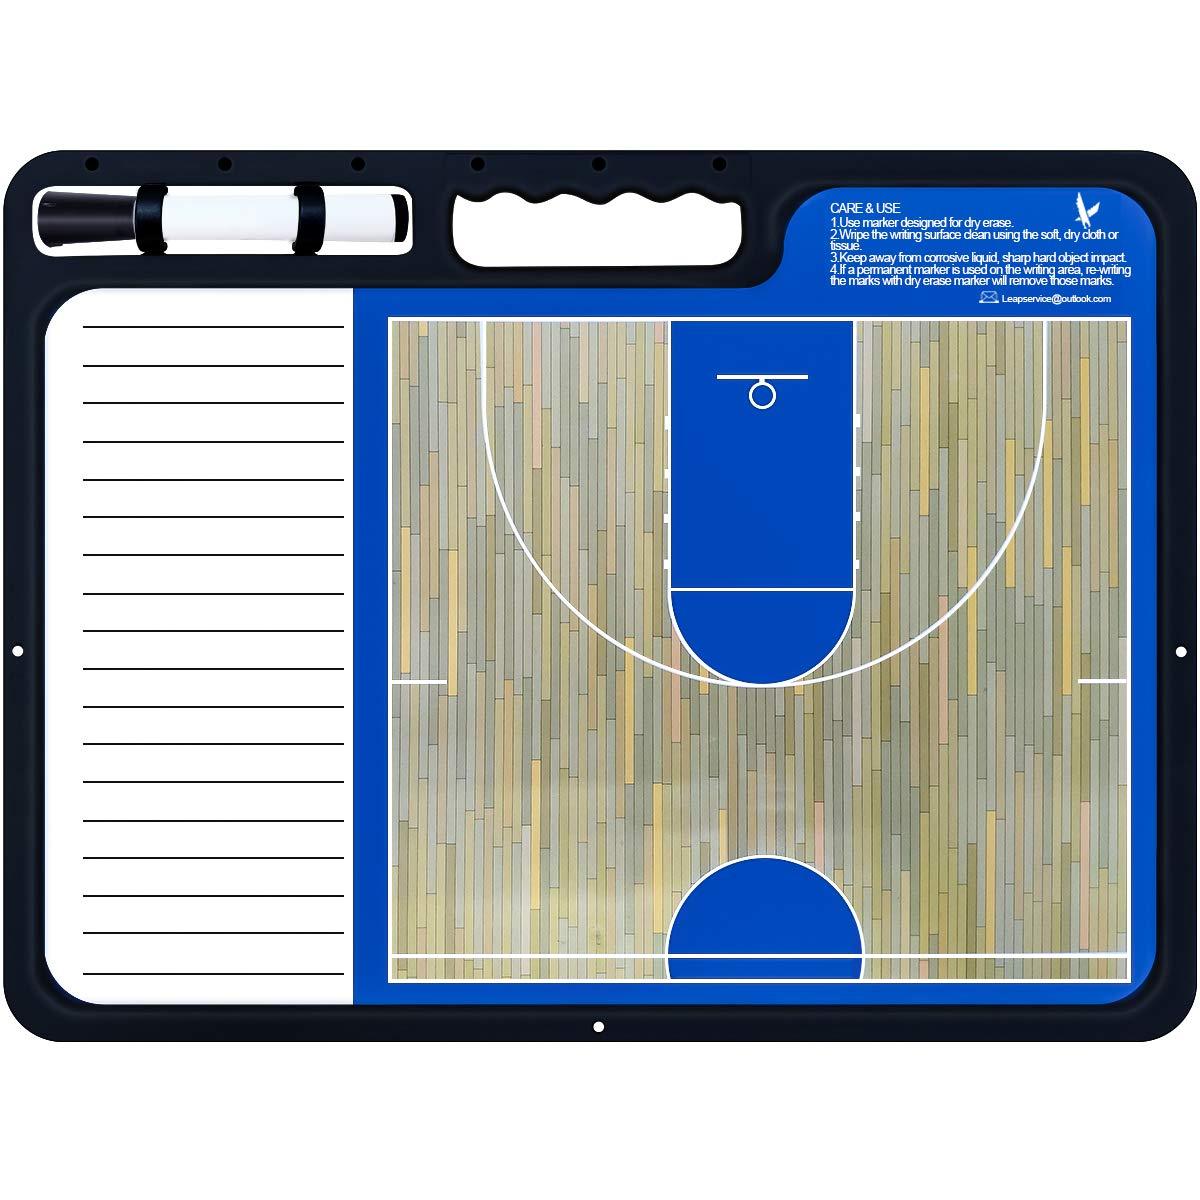 Amazon.com: LEAP Coach – Tabla de baloncesto táctica de ...